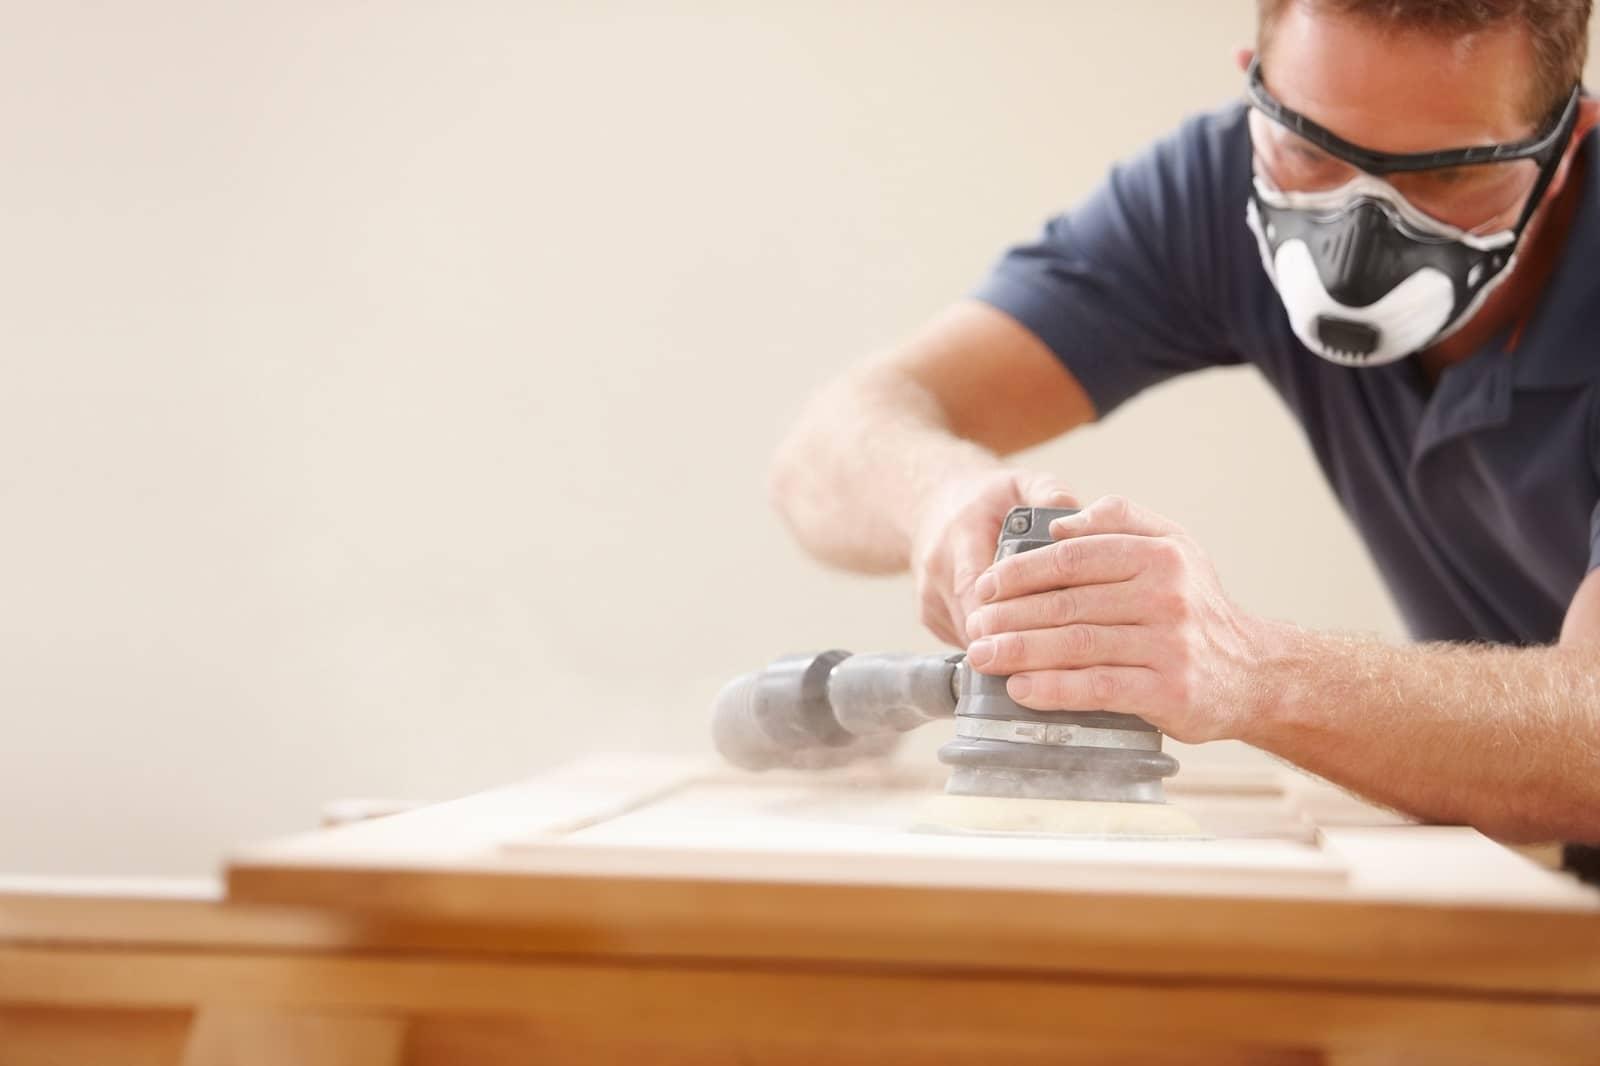 Carpenter using an electric sander